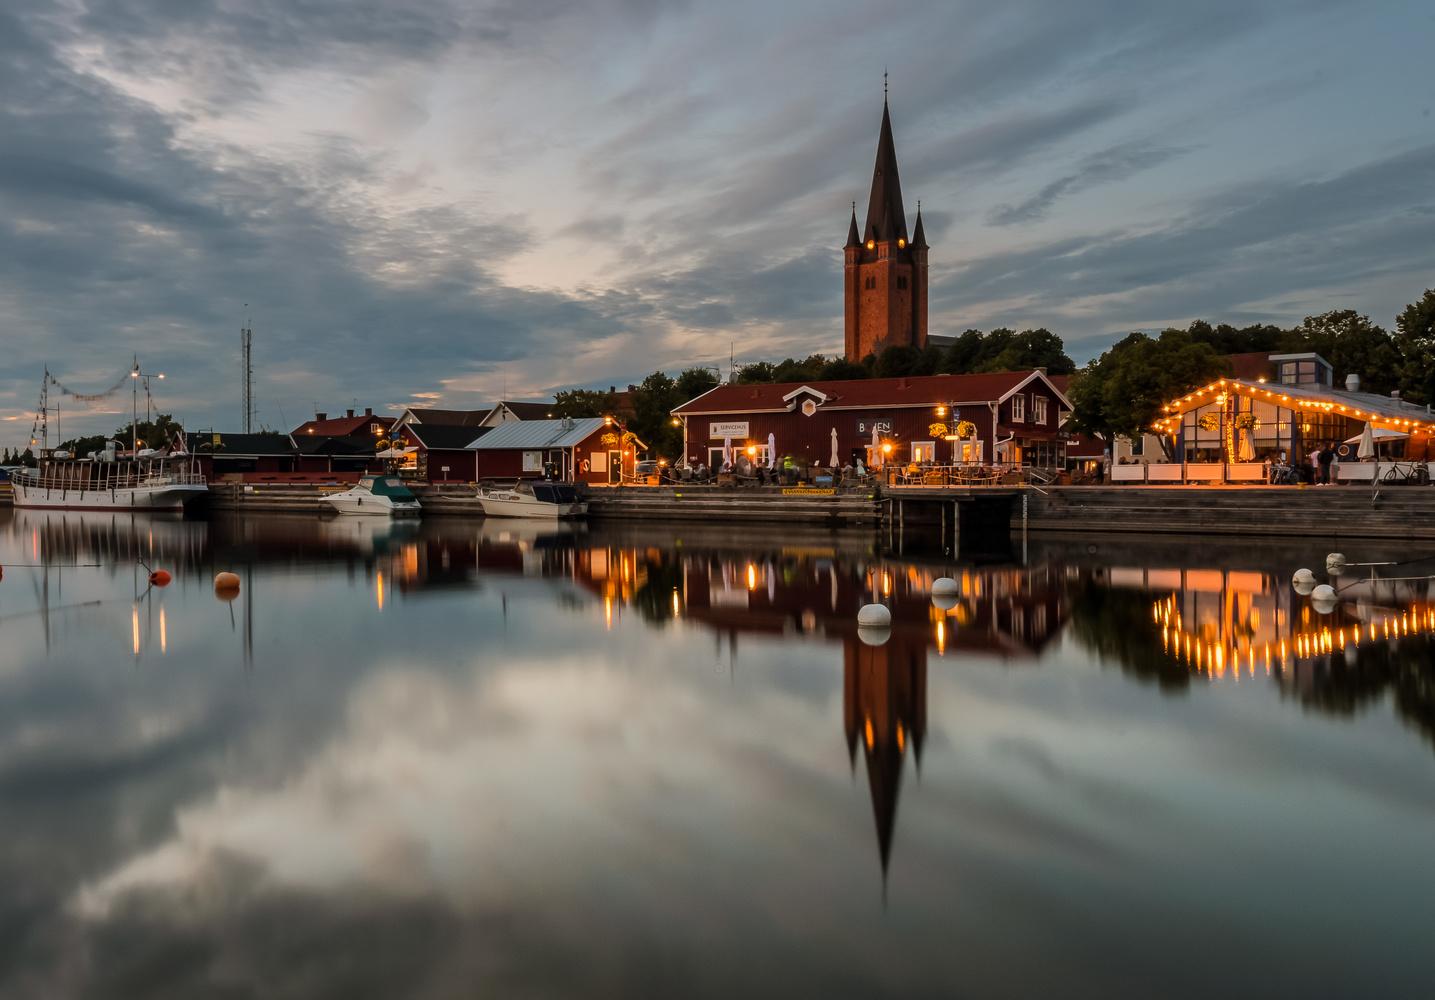 Mariestad's guest harbor by Daniel Beckman